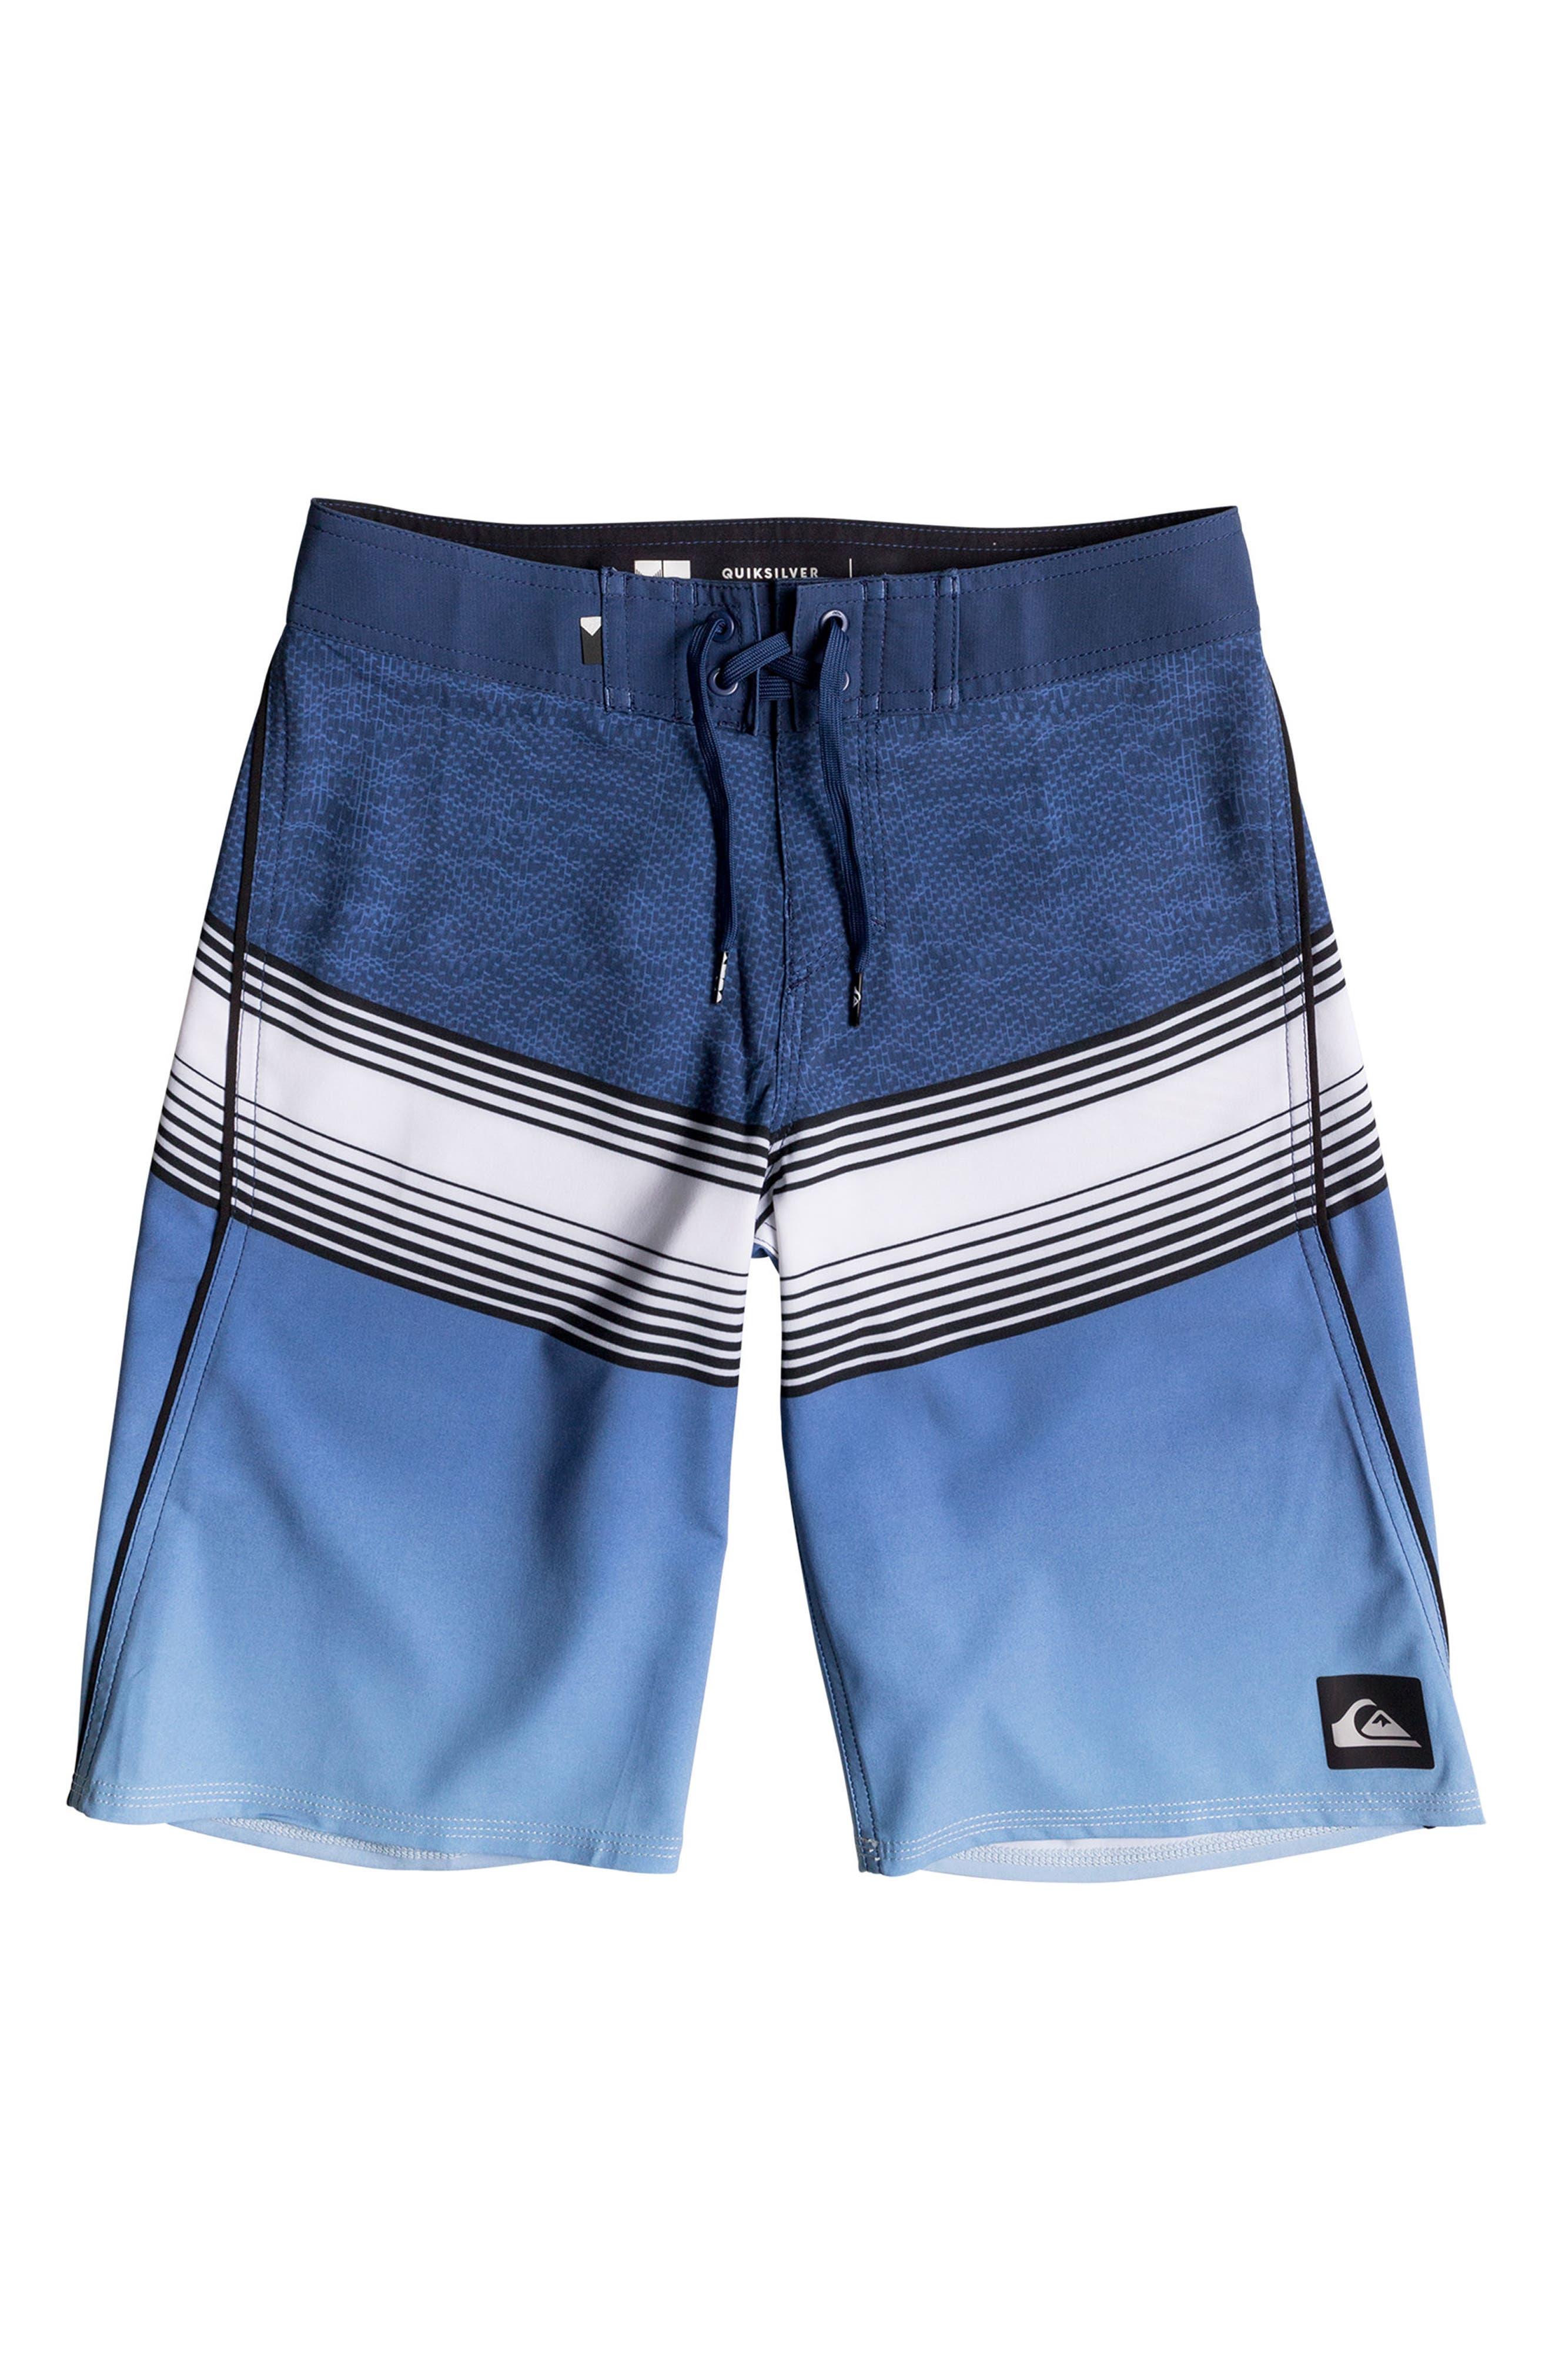 Main Image - Quiksilver Division Fade Board Shorts (Big Boys)